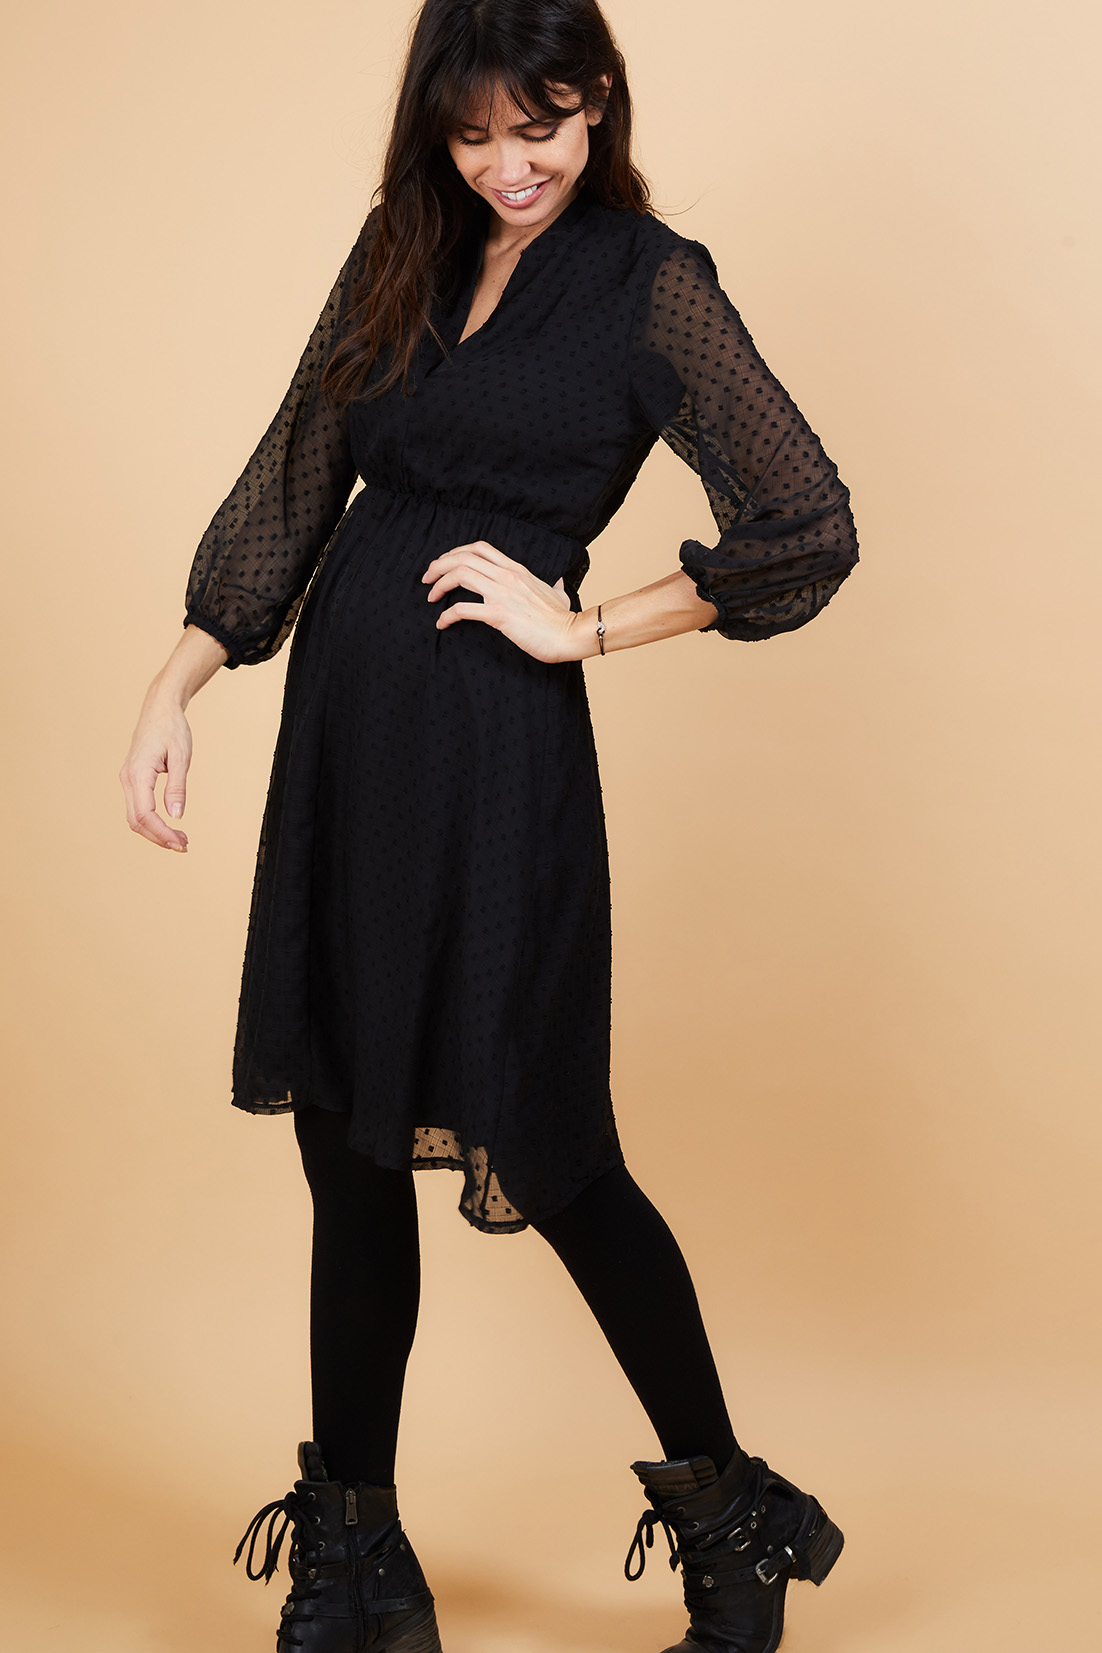 Robe Noire Cintree Femmes Robe Jupe Combinaison Lora